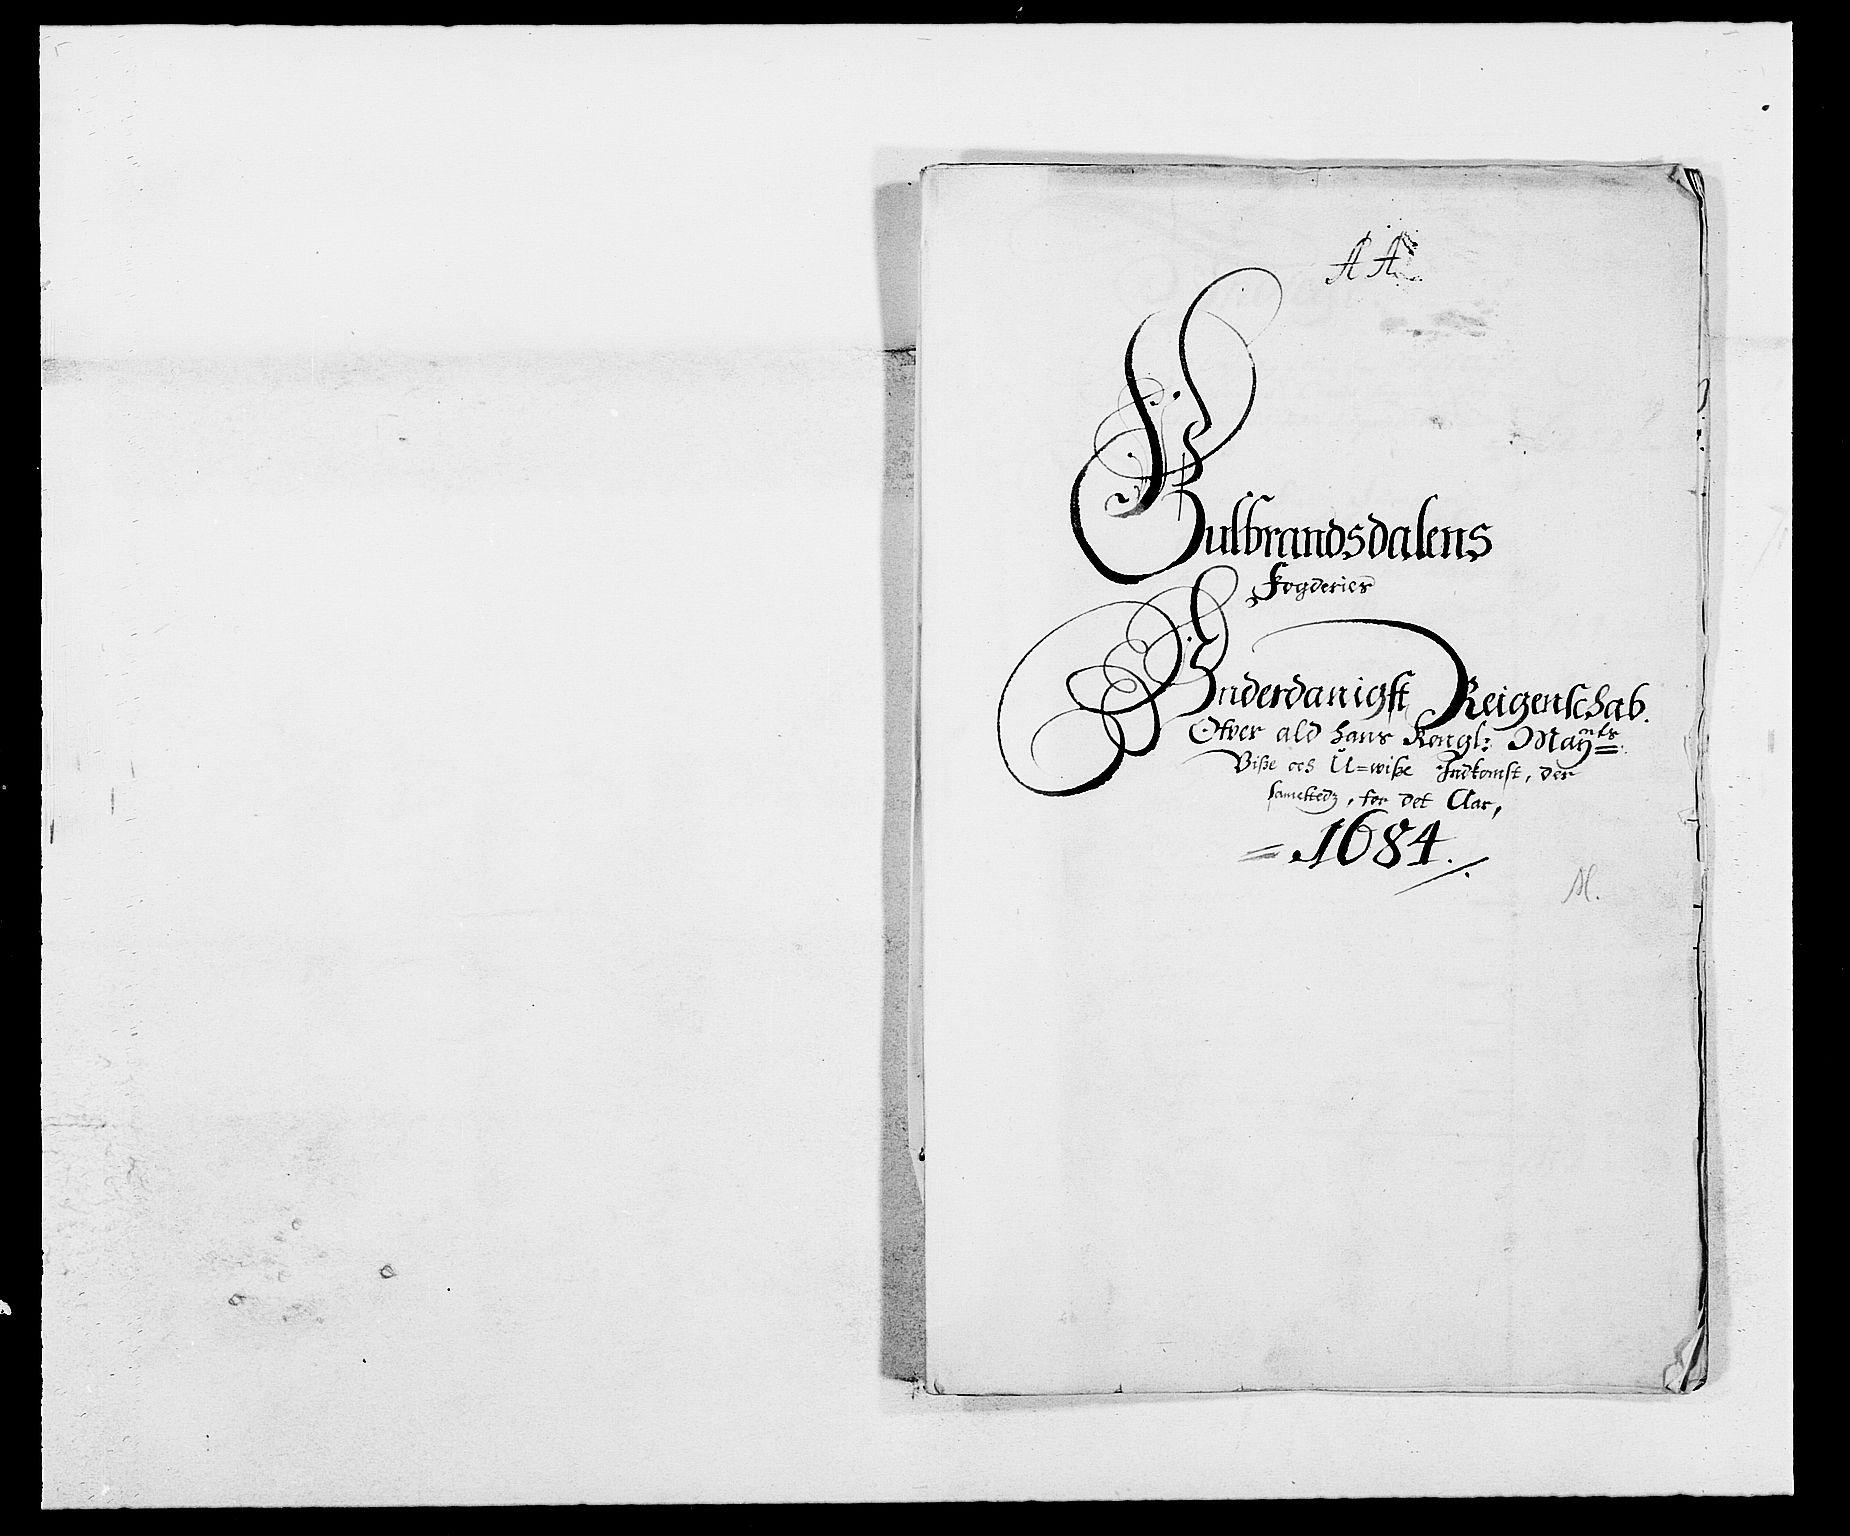 RA, Rentekammeret inntil 1814, Reviderte regnskaper, Fogderegnskap, R17/L1159: Fogderegnskap Gudbrandsdal, 1682-1689, s. 2